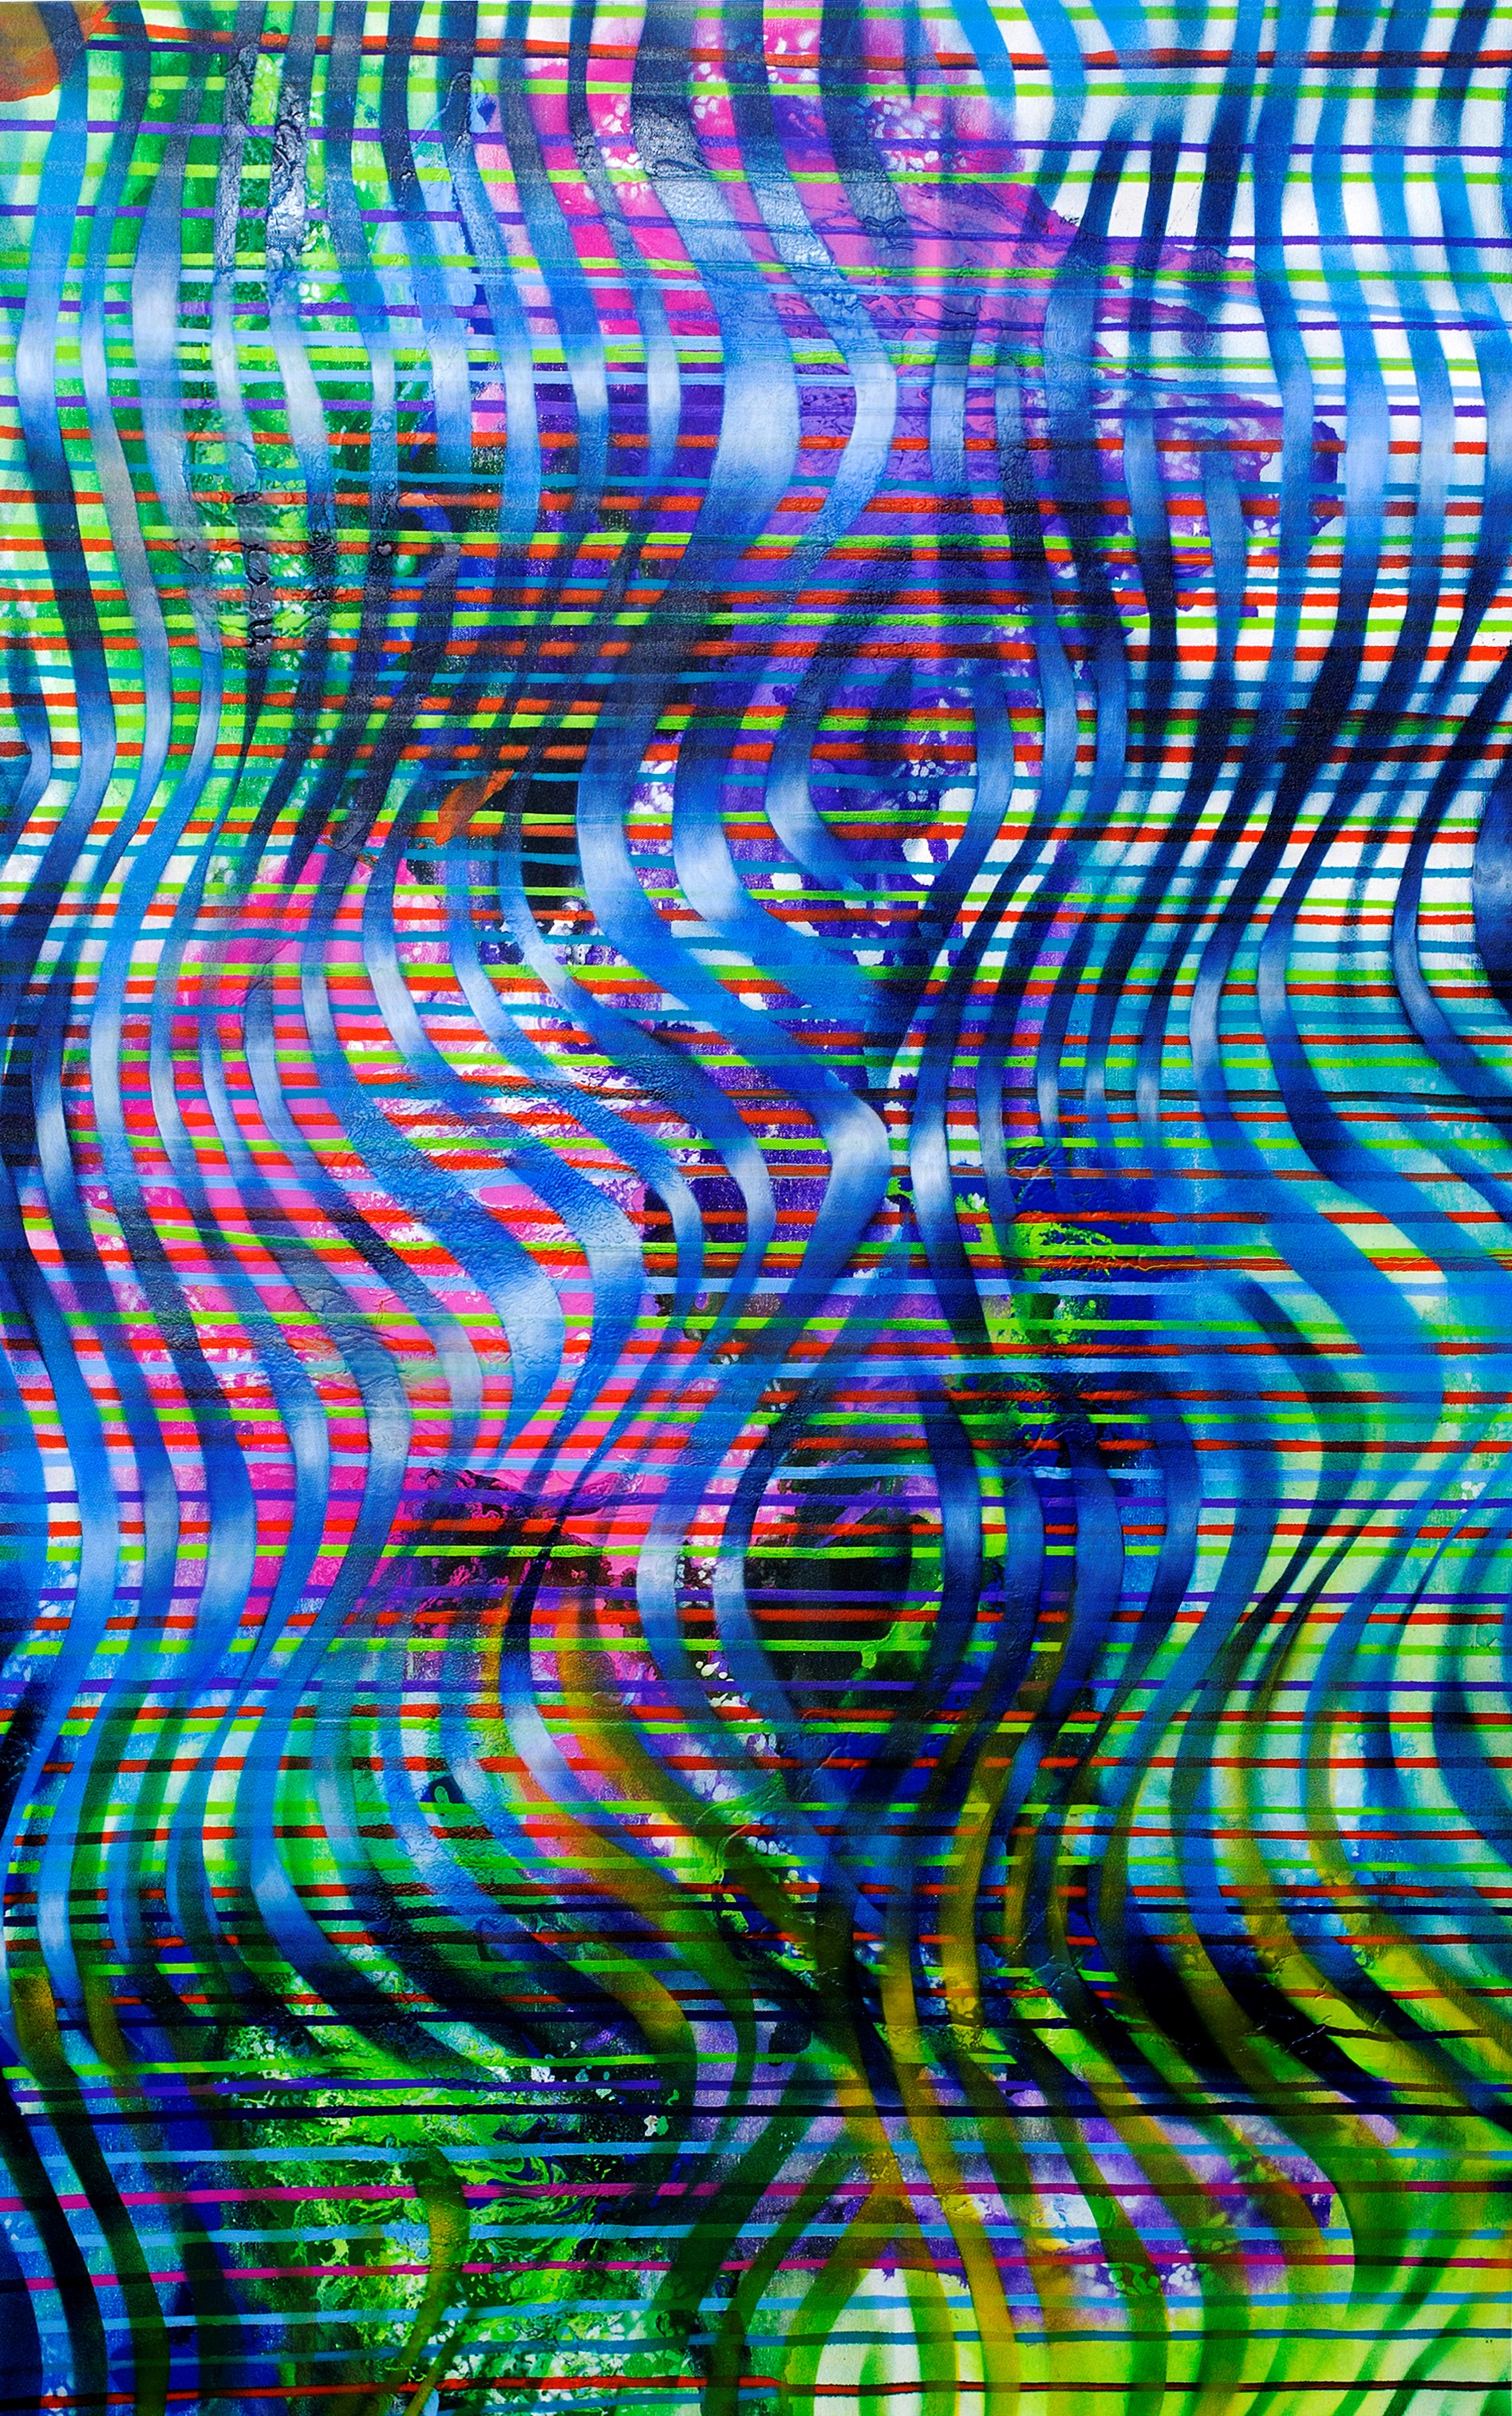 Mariu_F._Lacayo_WAVE_MIRRORS_mixed_media_on_canvas135_x_83_cm._2017.jpg